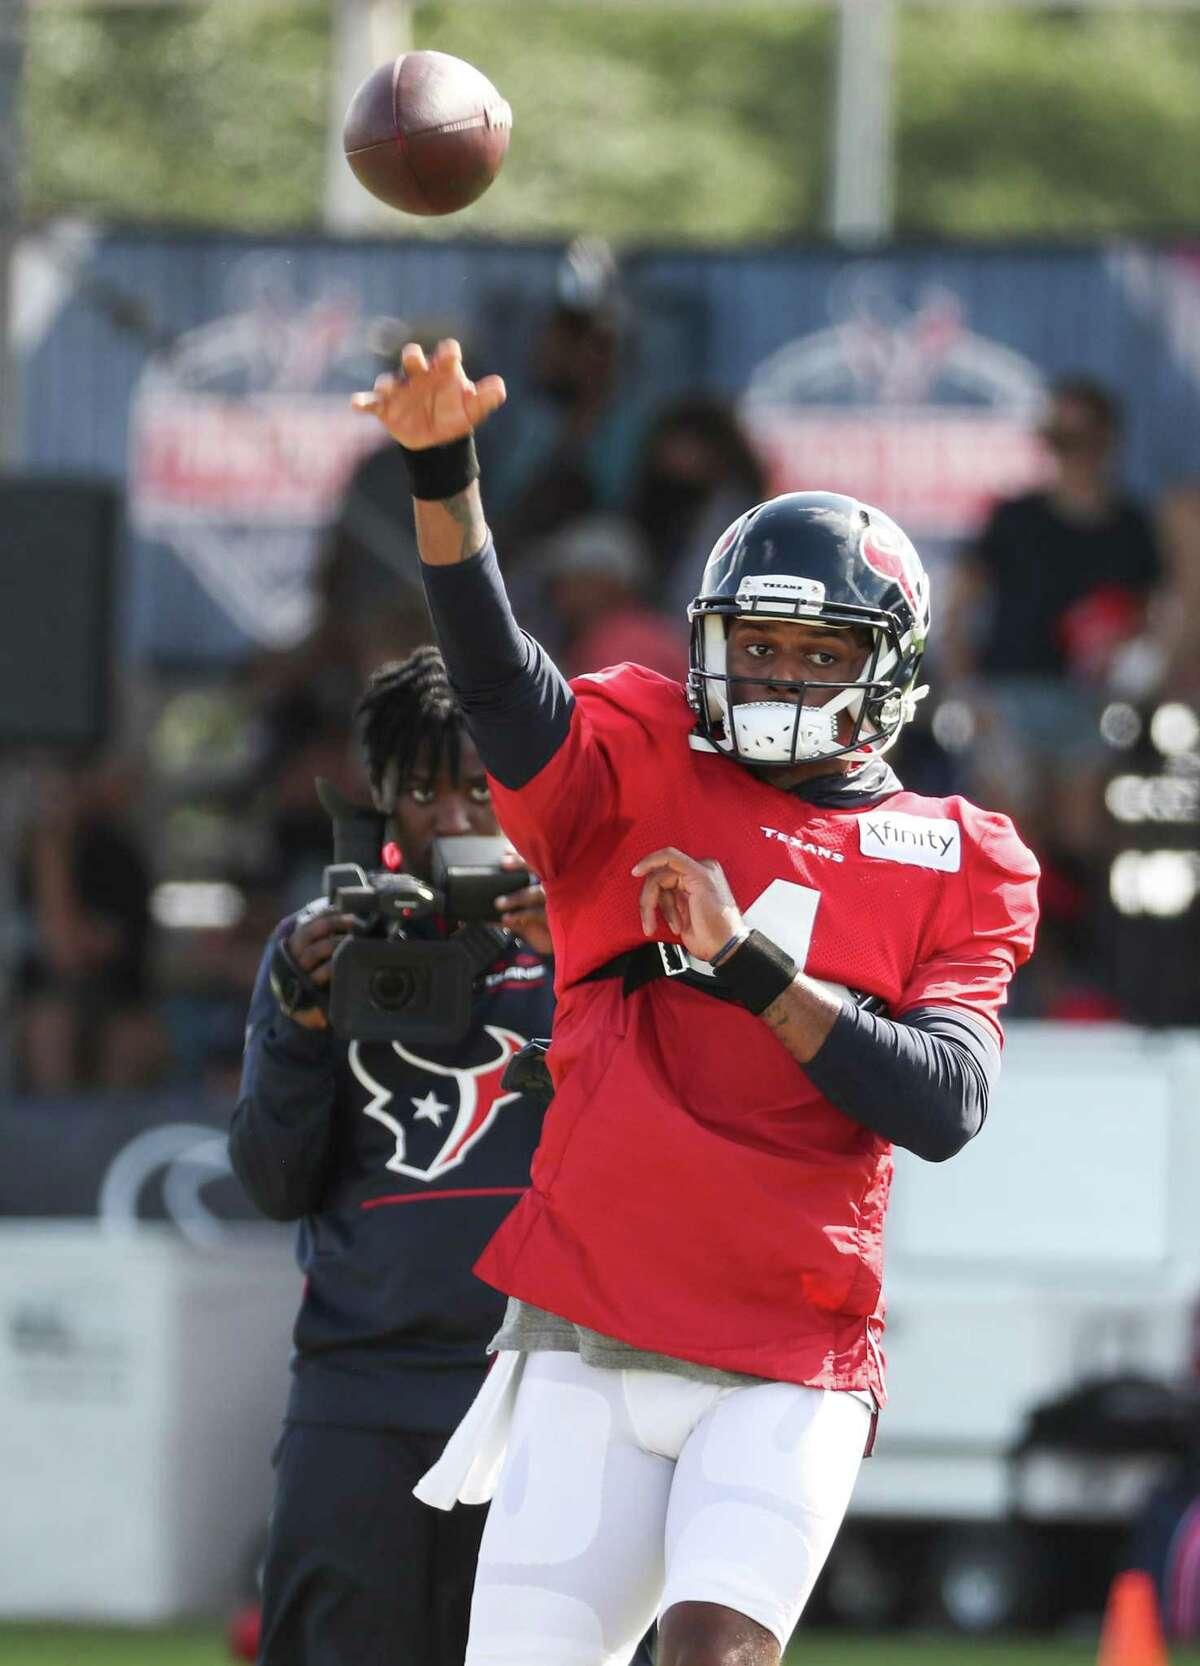 Houston Texans quarterback Deshaun Watson (4) throws a pass during an NFL training camp football practice Monday, Aug. 9, 2021, in Houston.